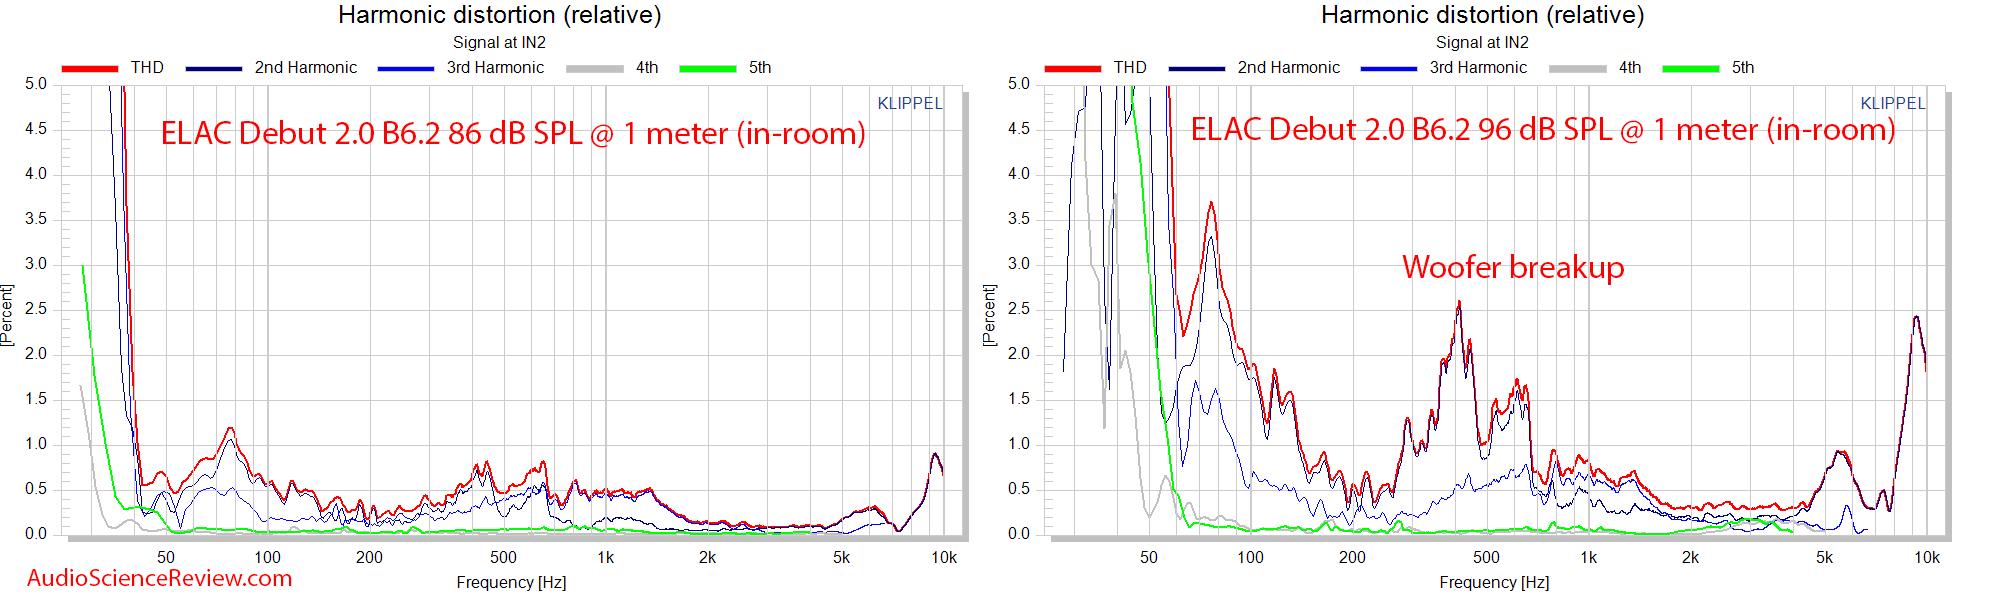 ELAC Debut 2.0 B6.2 relative THD distortion measurements.png